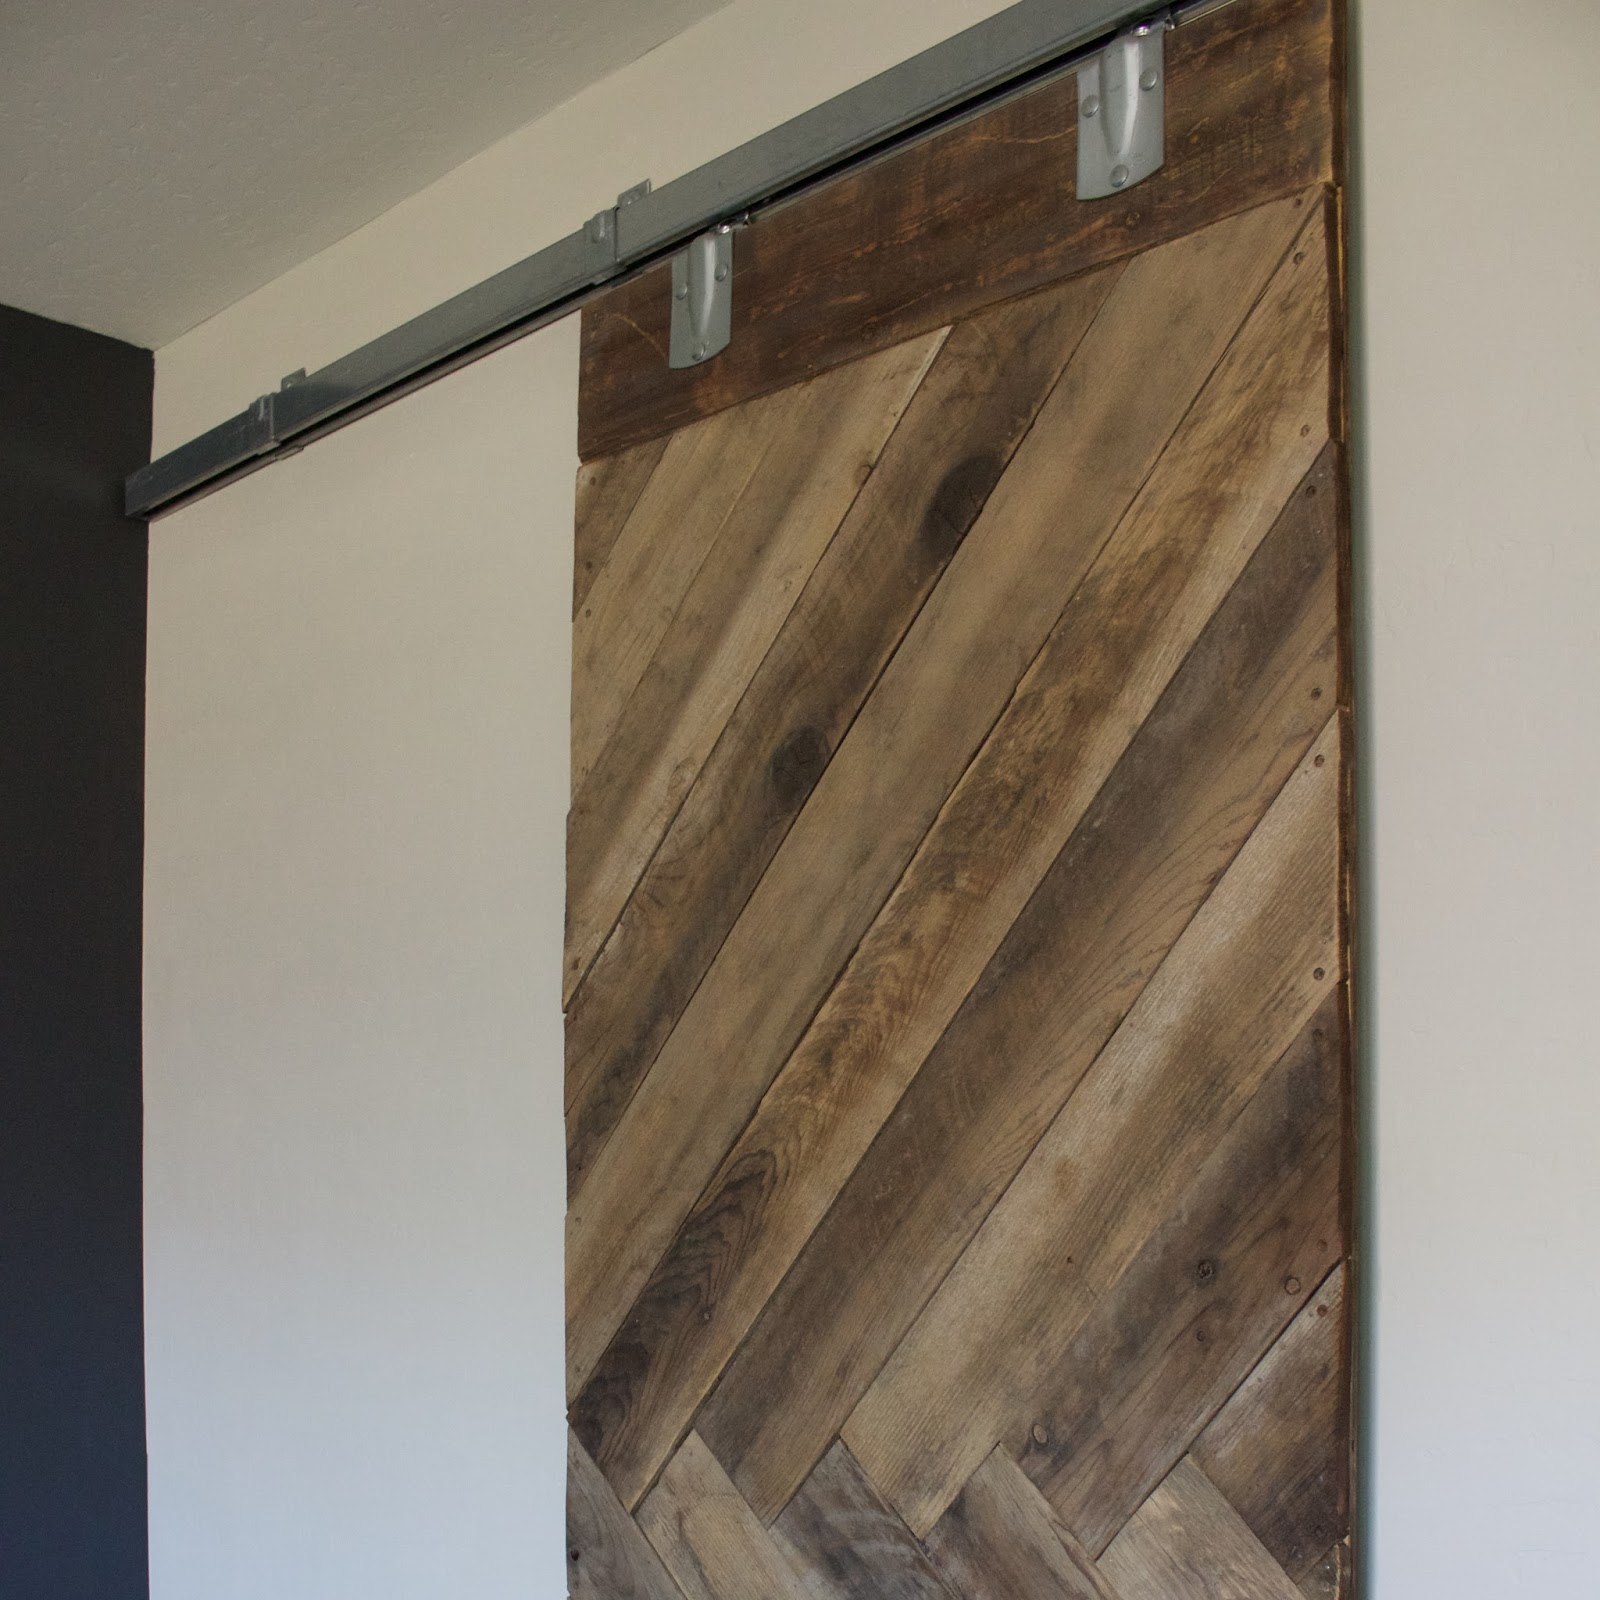 Sliding barn door in house - Sliding Barn Door In House 1